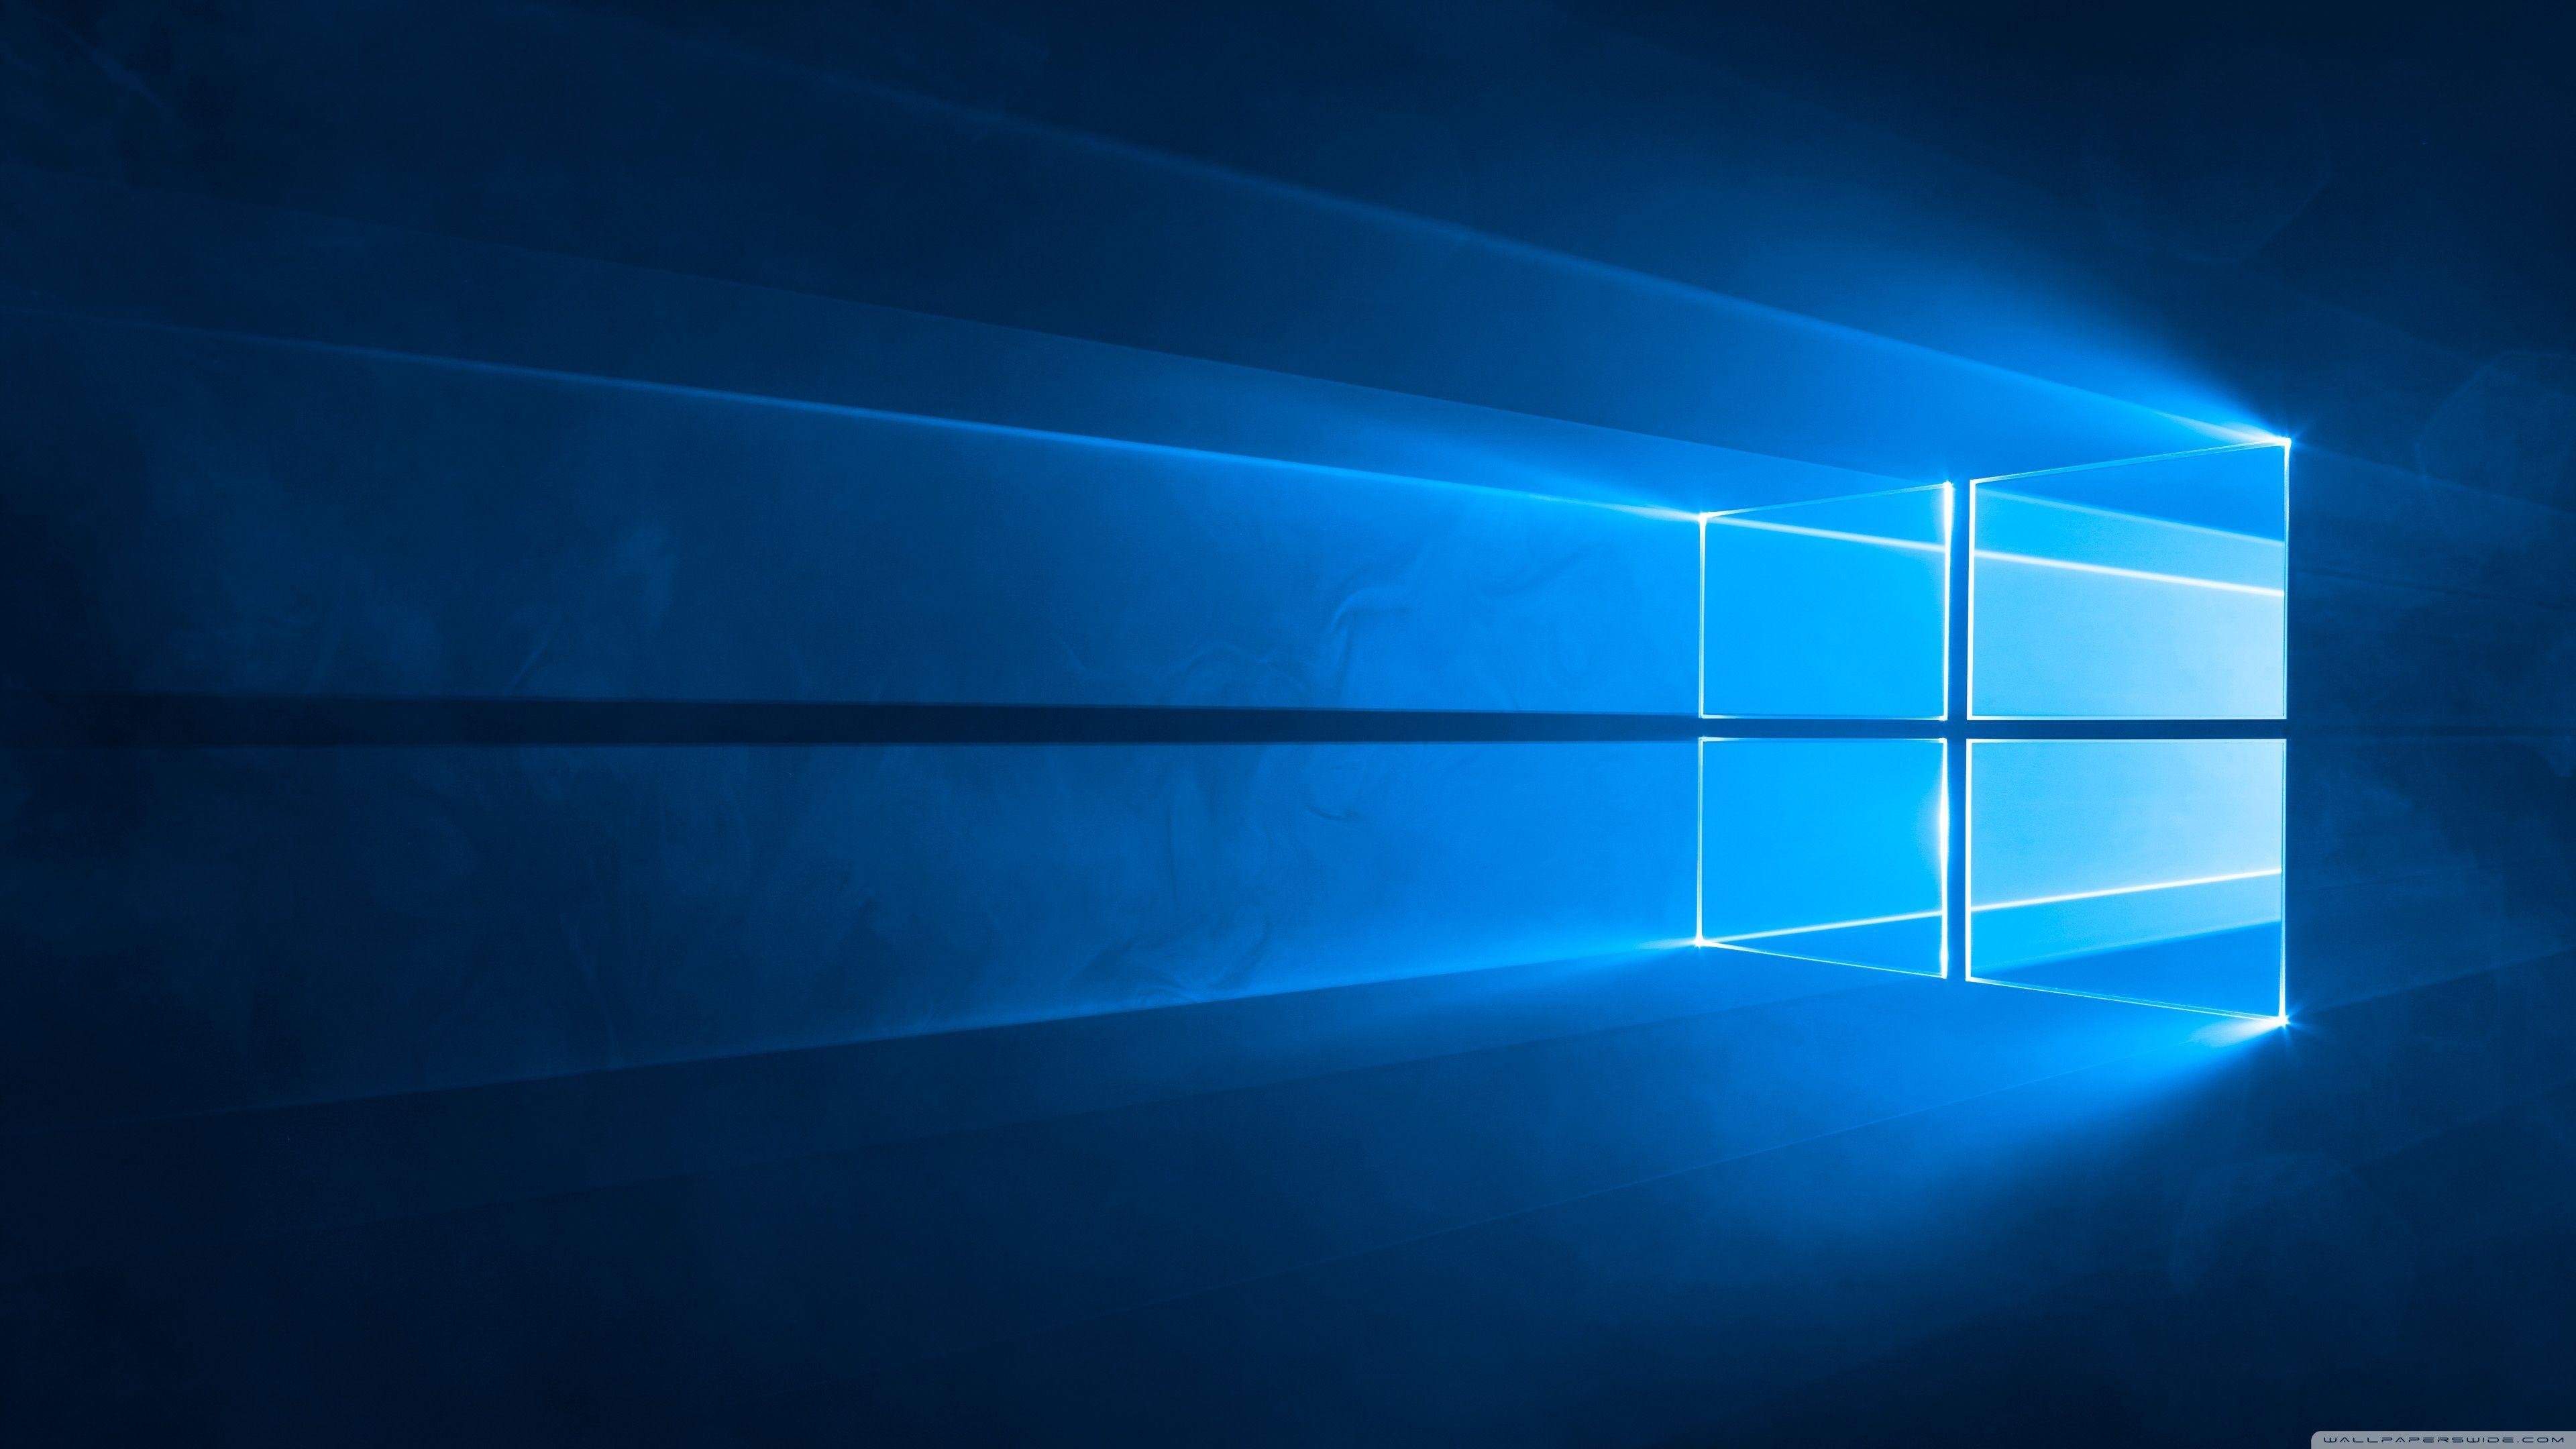 Windows 10 Hd Wallpapers Top Free Windows 10 Hd Backgrounds